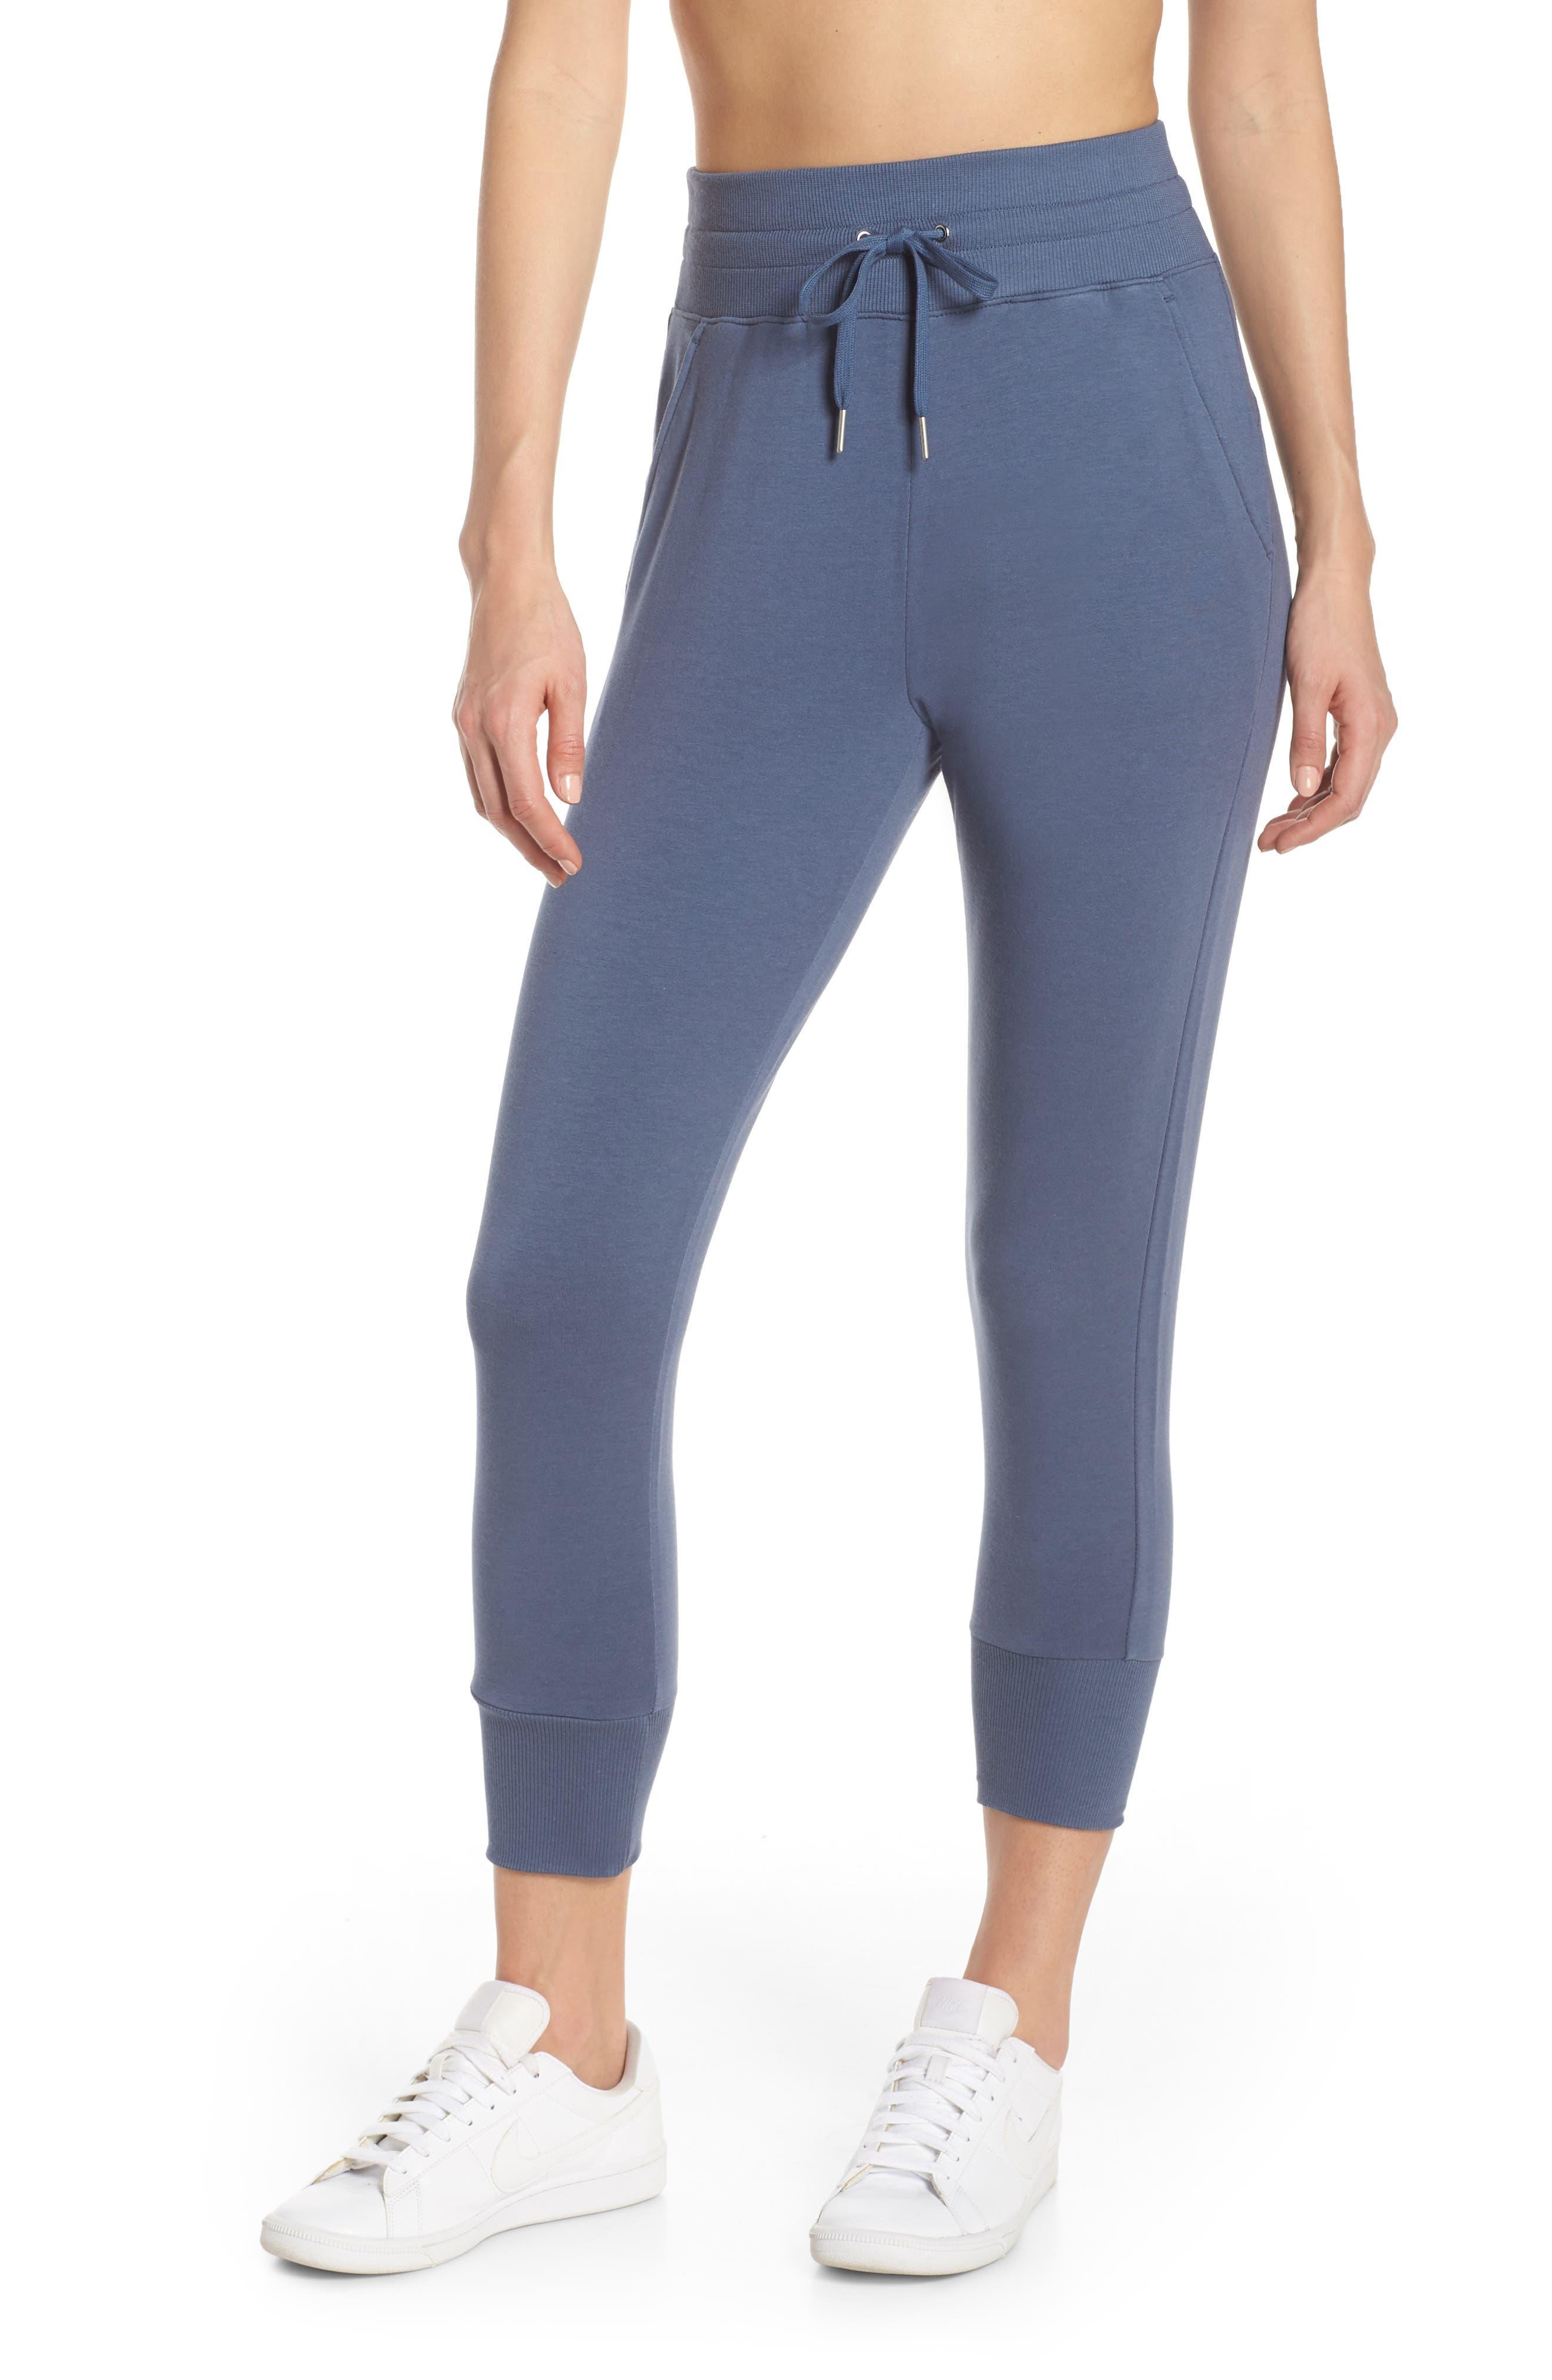 ZELLA, Repeat High Waist Crop Jogger Pants, Main thumbnail 1, color, BLUE VINTAGE